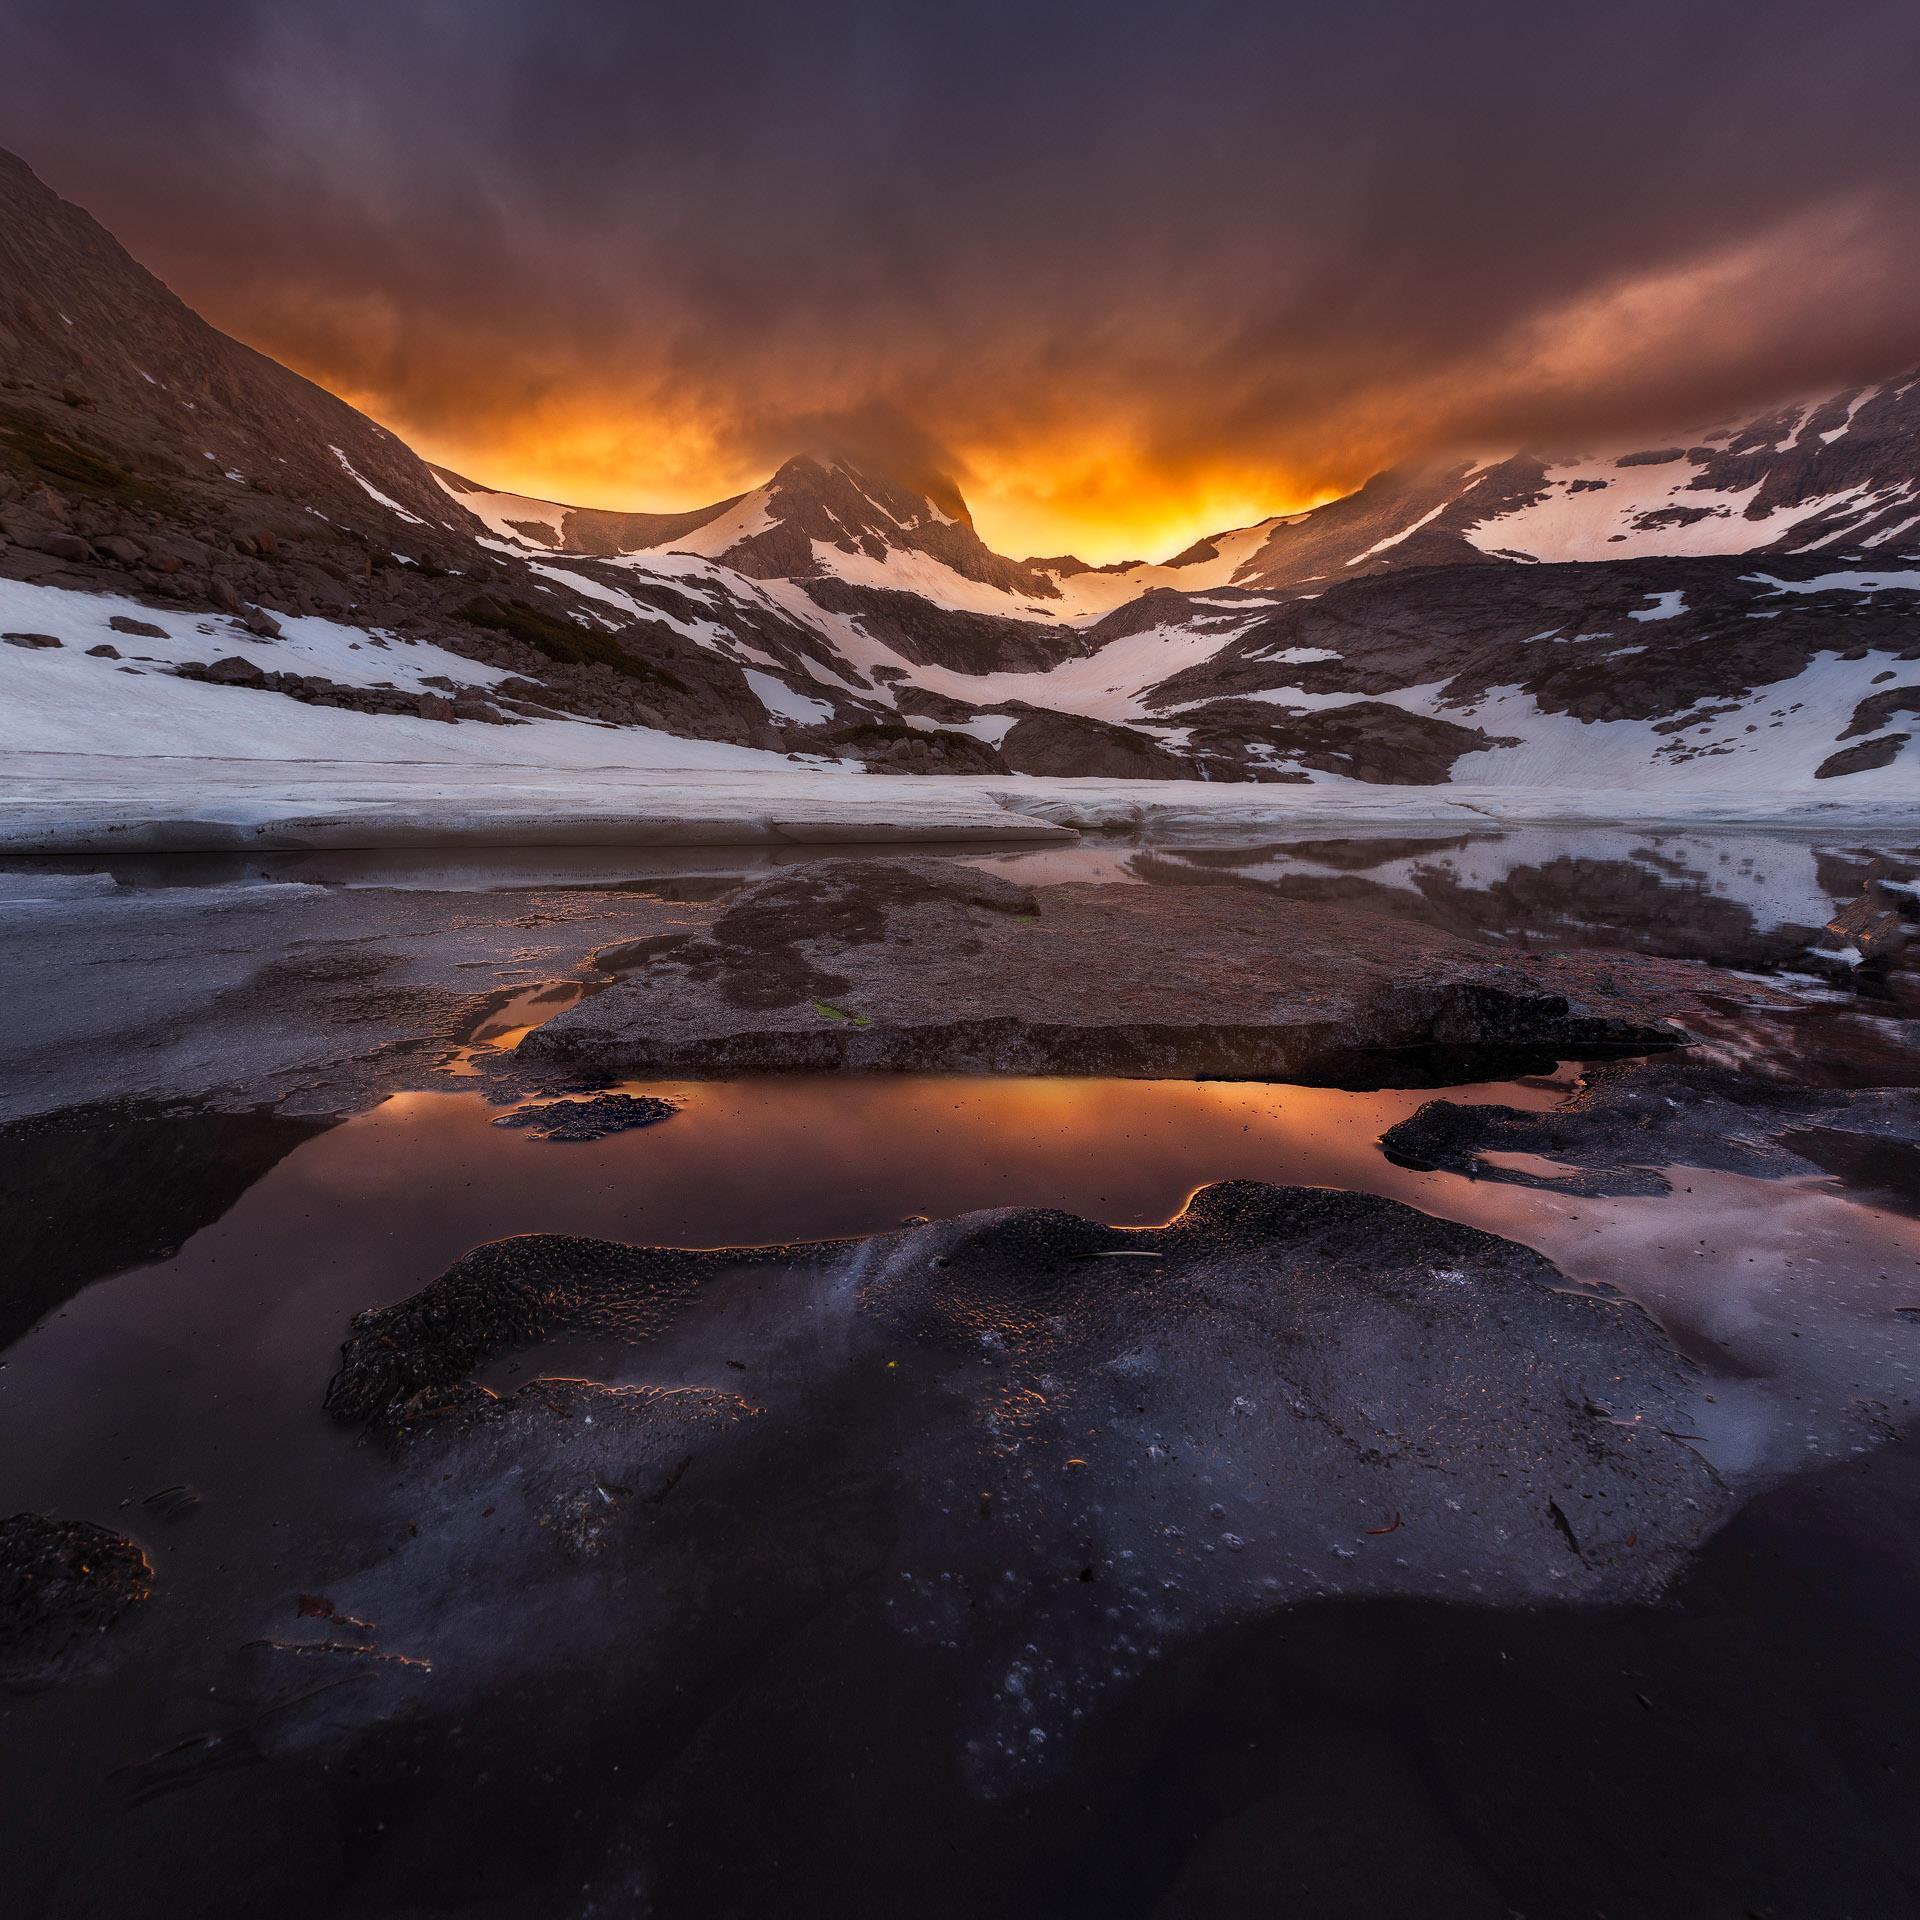 Sunset at Blue Lake   David Kingham Photography